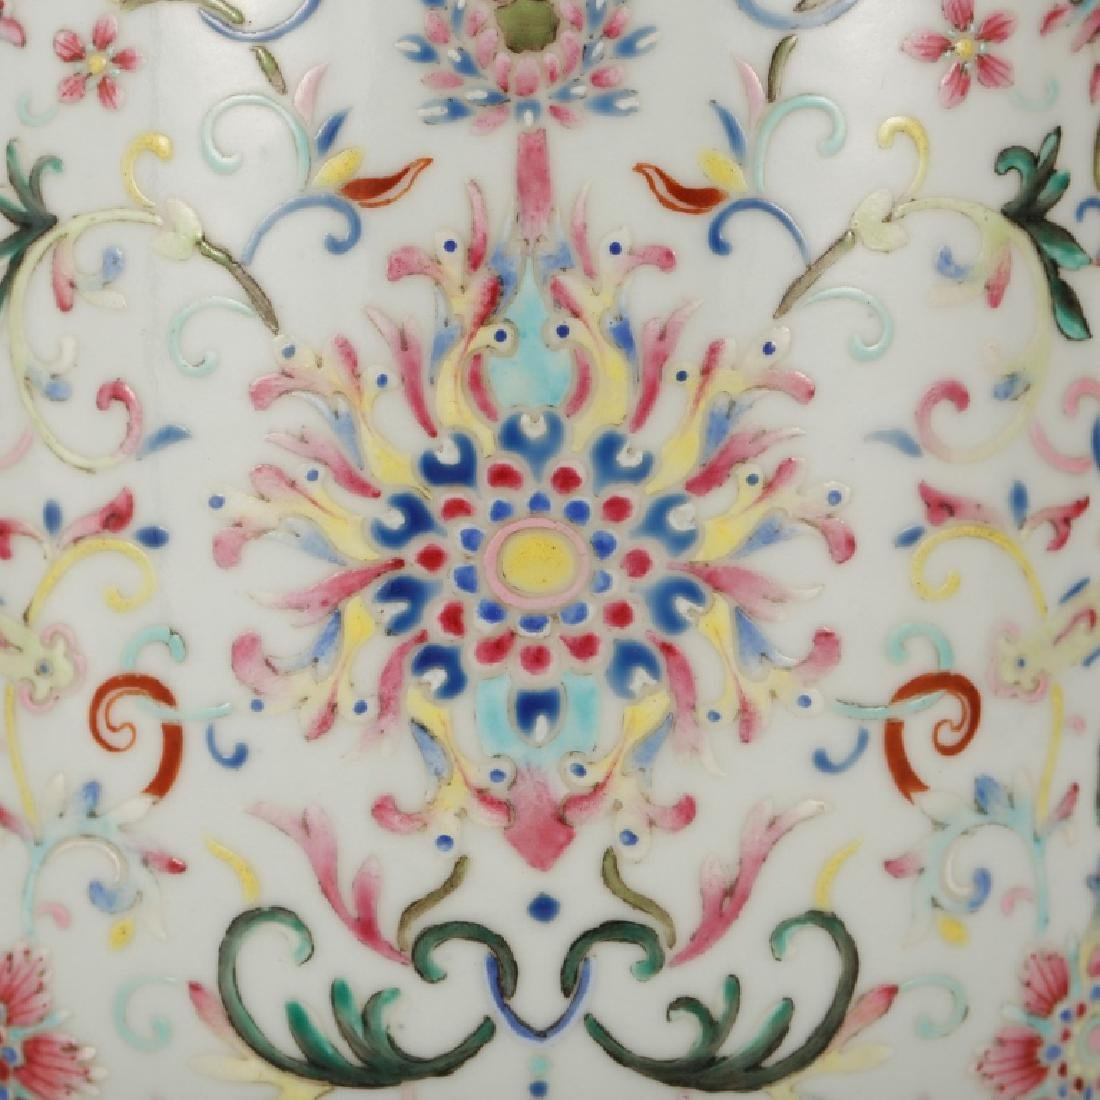 Chinese 19th C Famille Rose Enameled Porcelain - 5